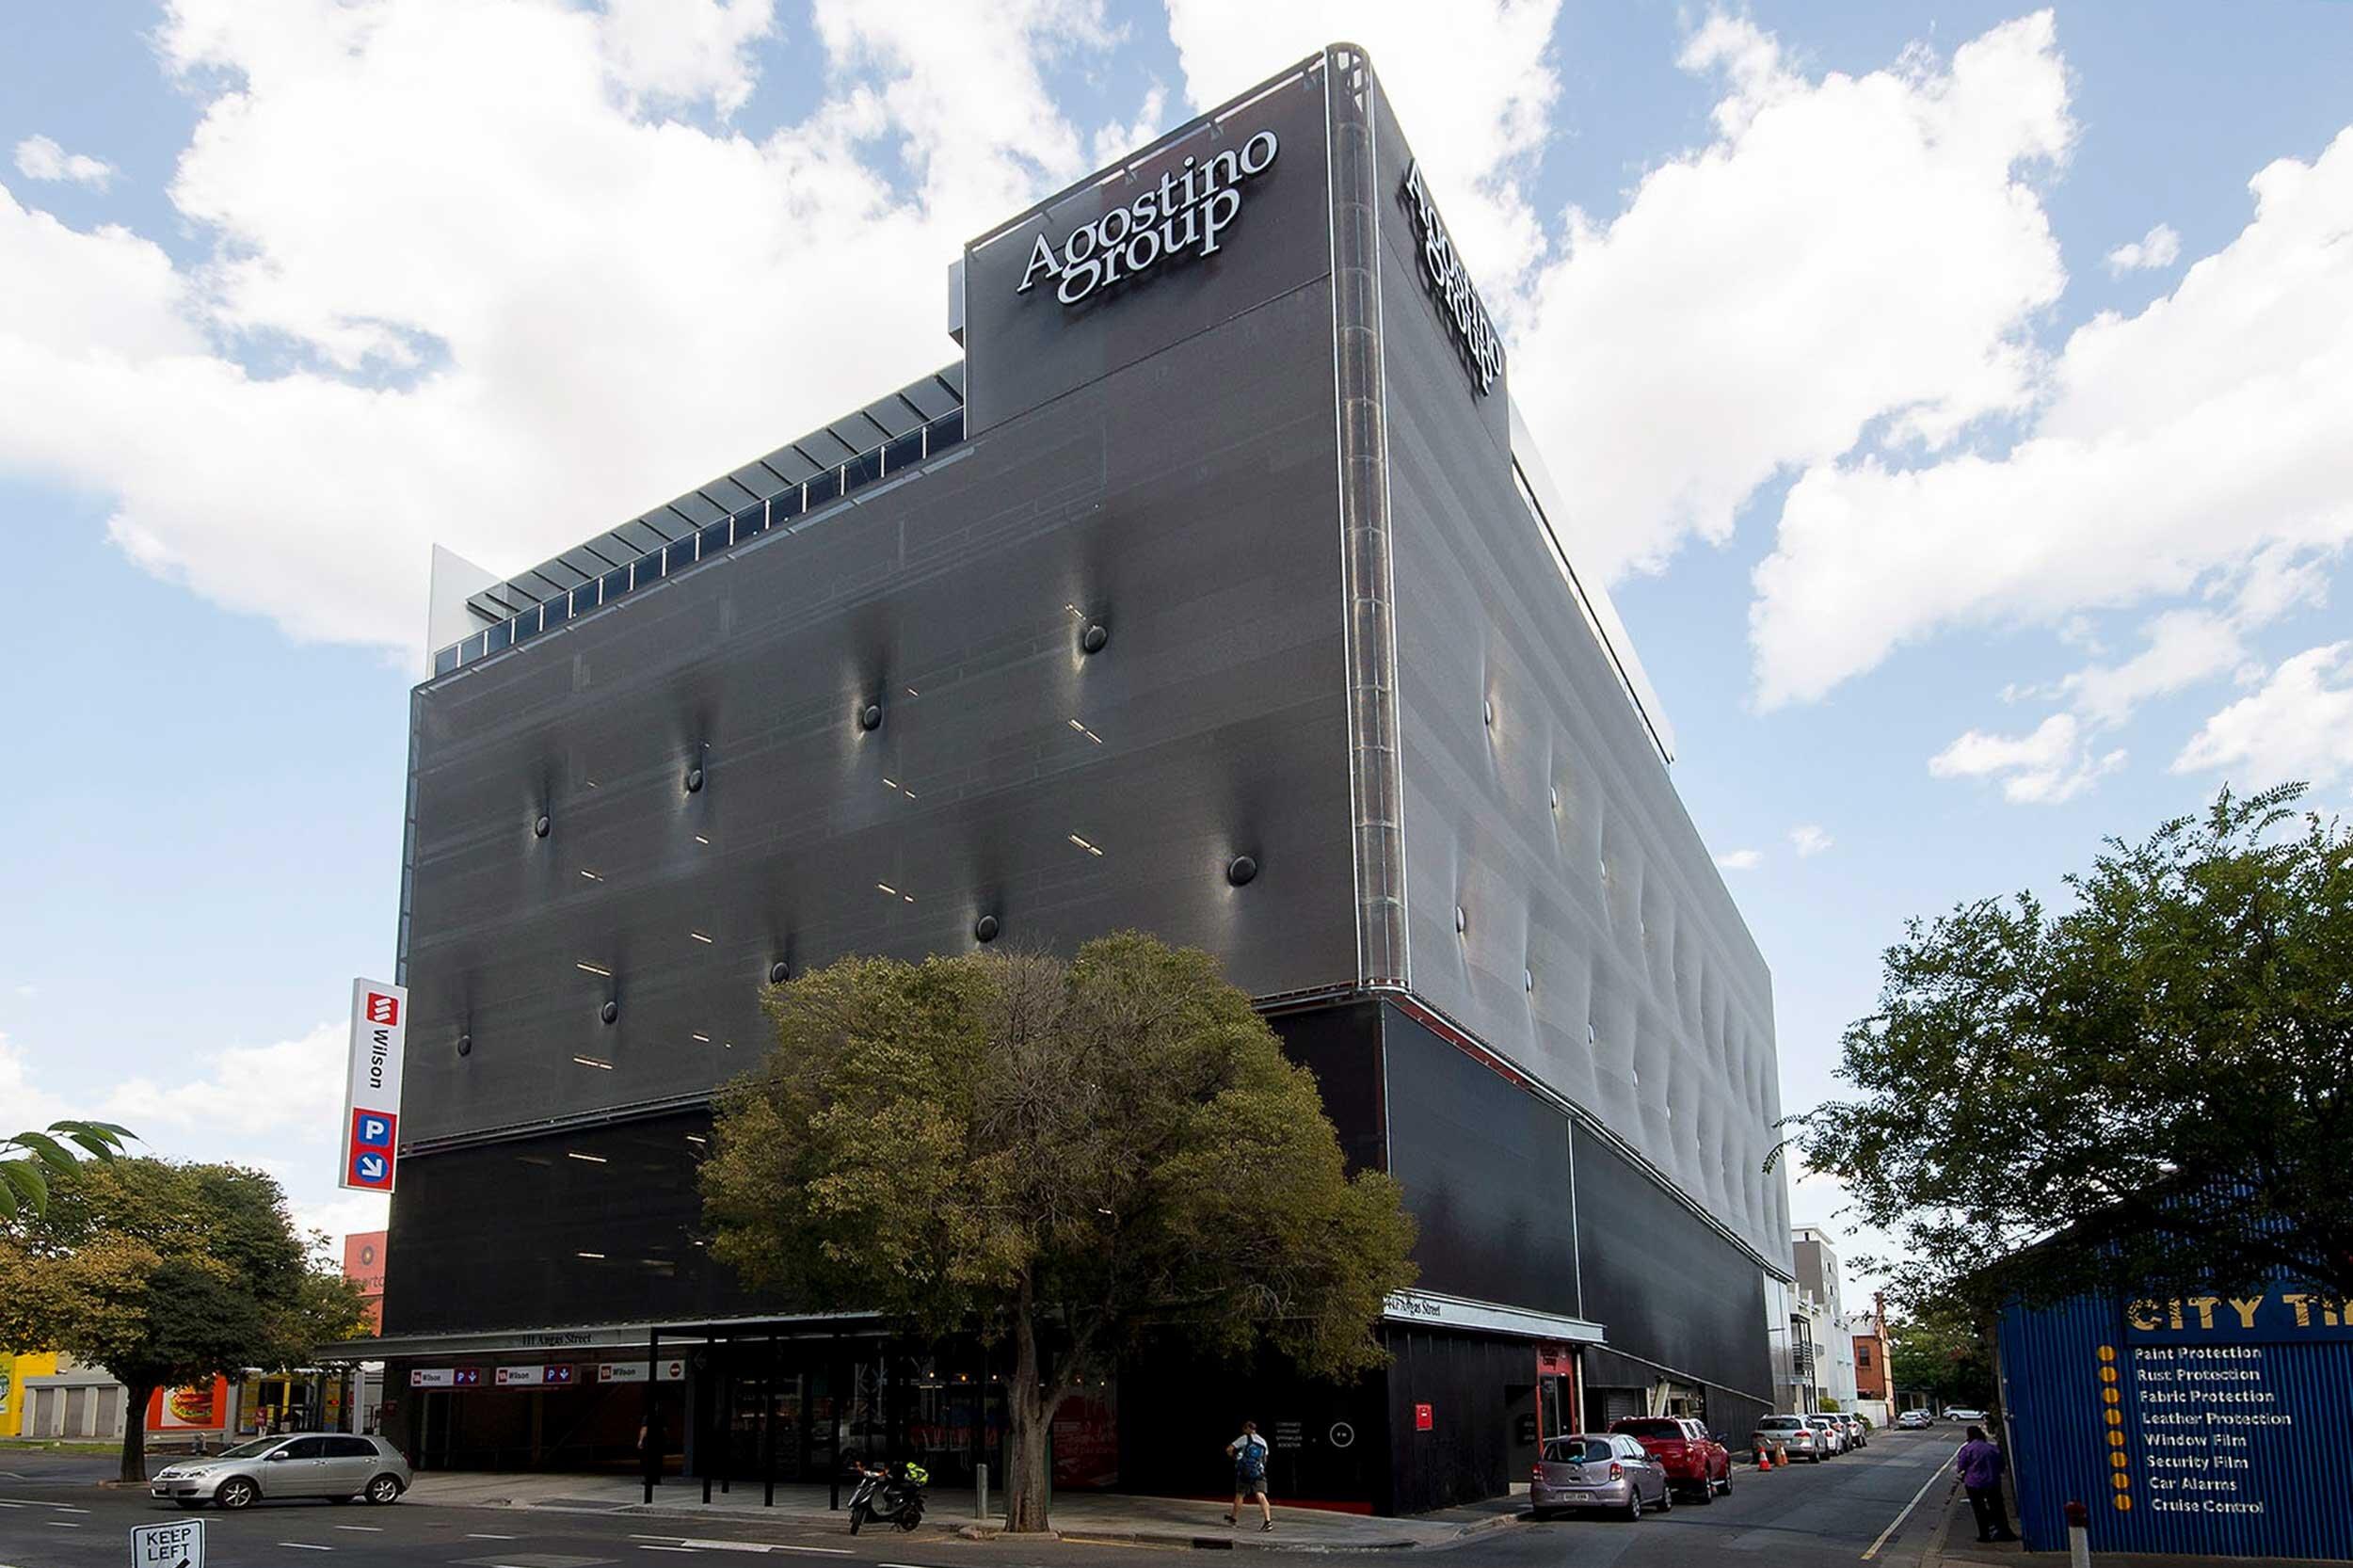 Agostino Group Parking Garage in Adelaide Australia using Kaynemaile mesh